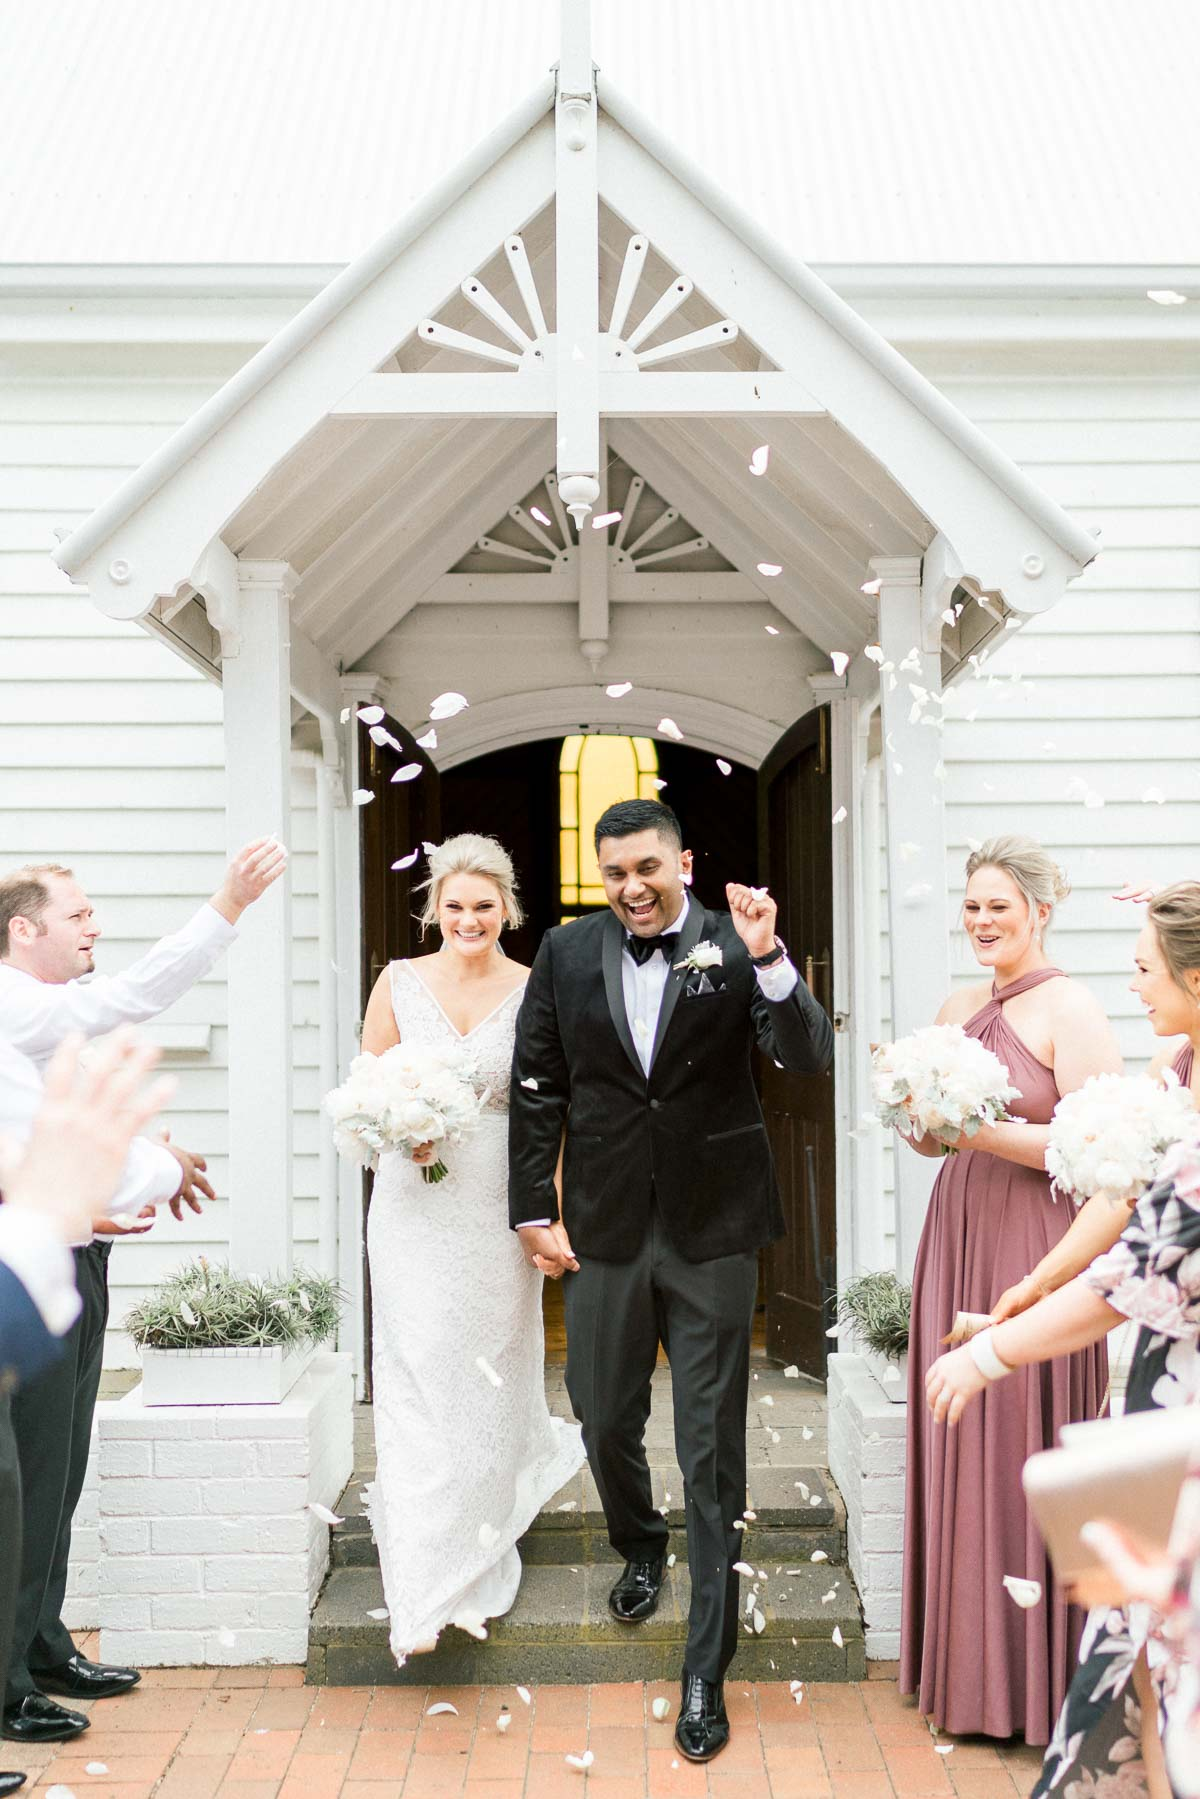 trenavin-chapel-phillip-island-wedding-heart+soul-weddings-sally-sean-00369.jpg